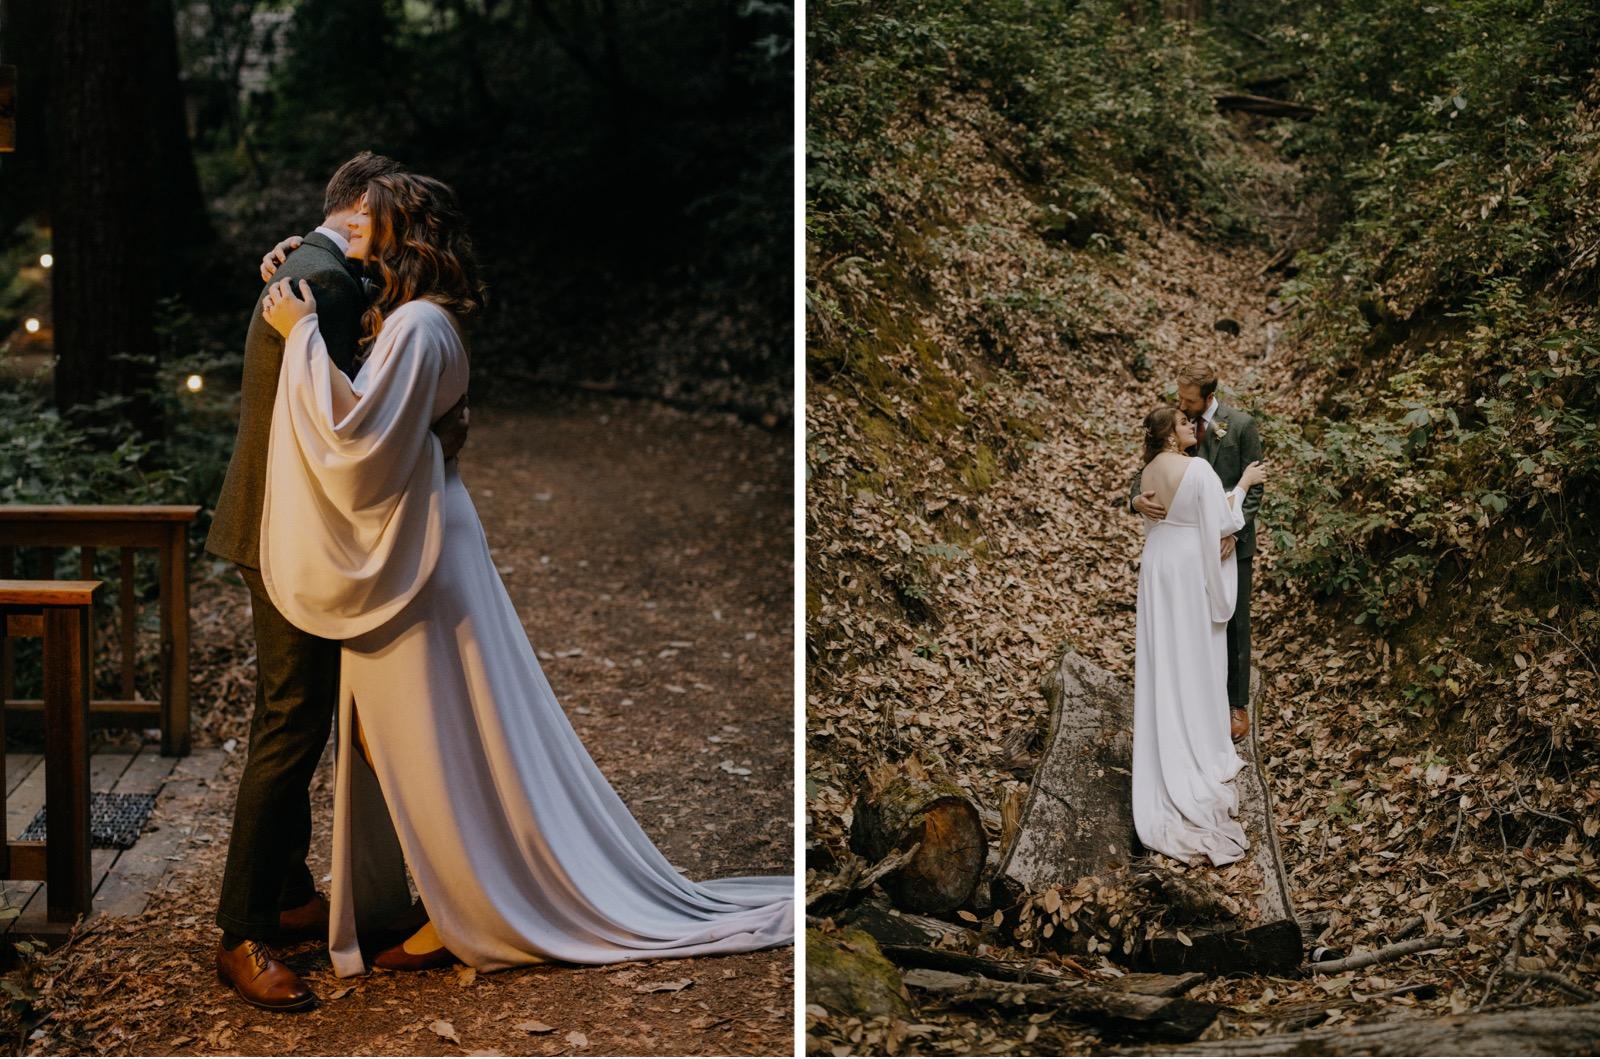 096_E&J 04457_Emily & Jeff Wedding 0860_the-waterfall-lodge_forest_wedding_ben-lomond_intimate